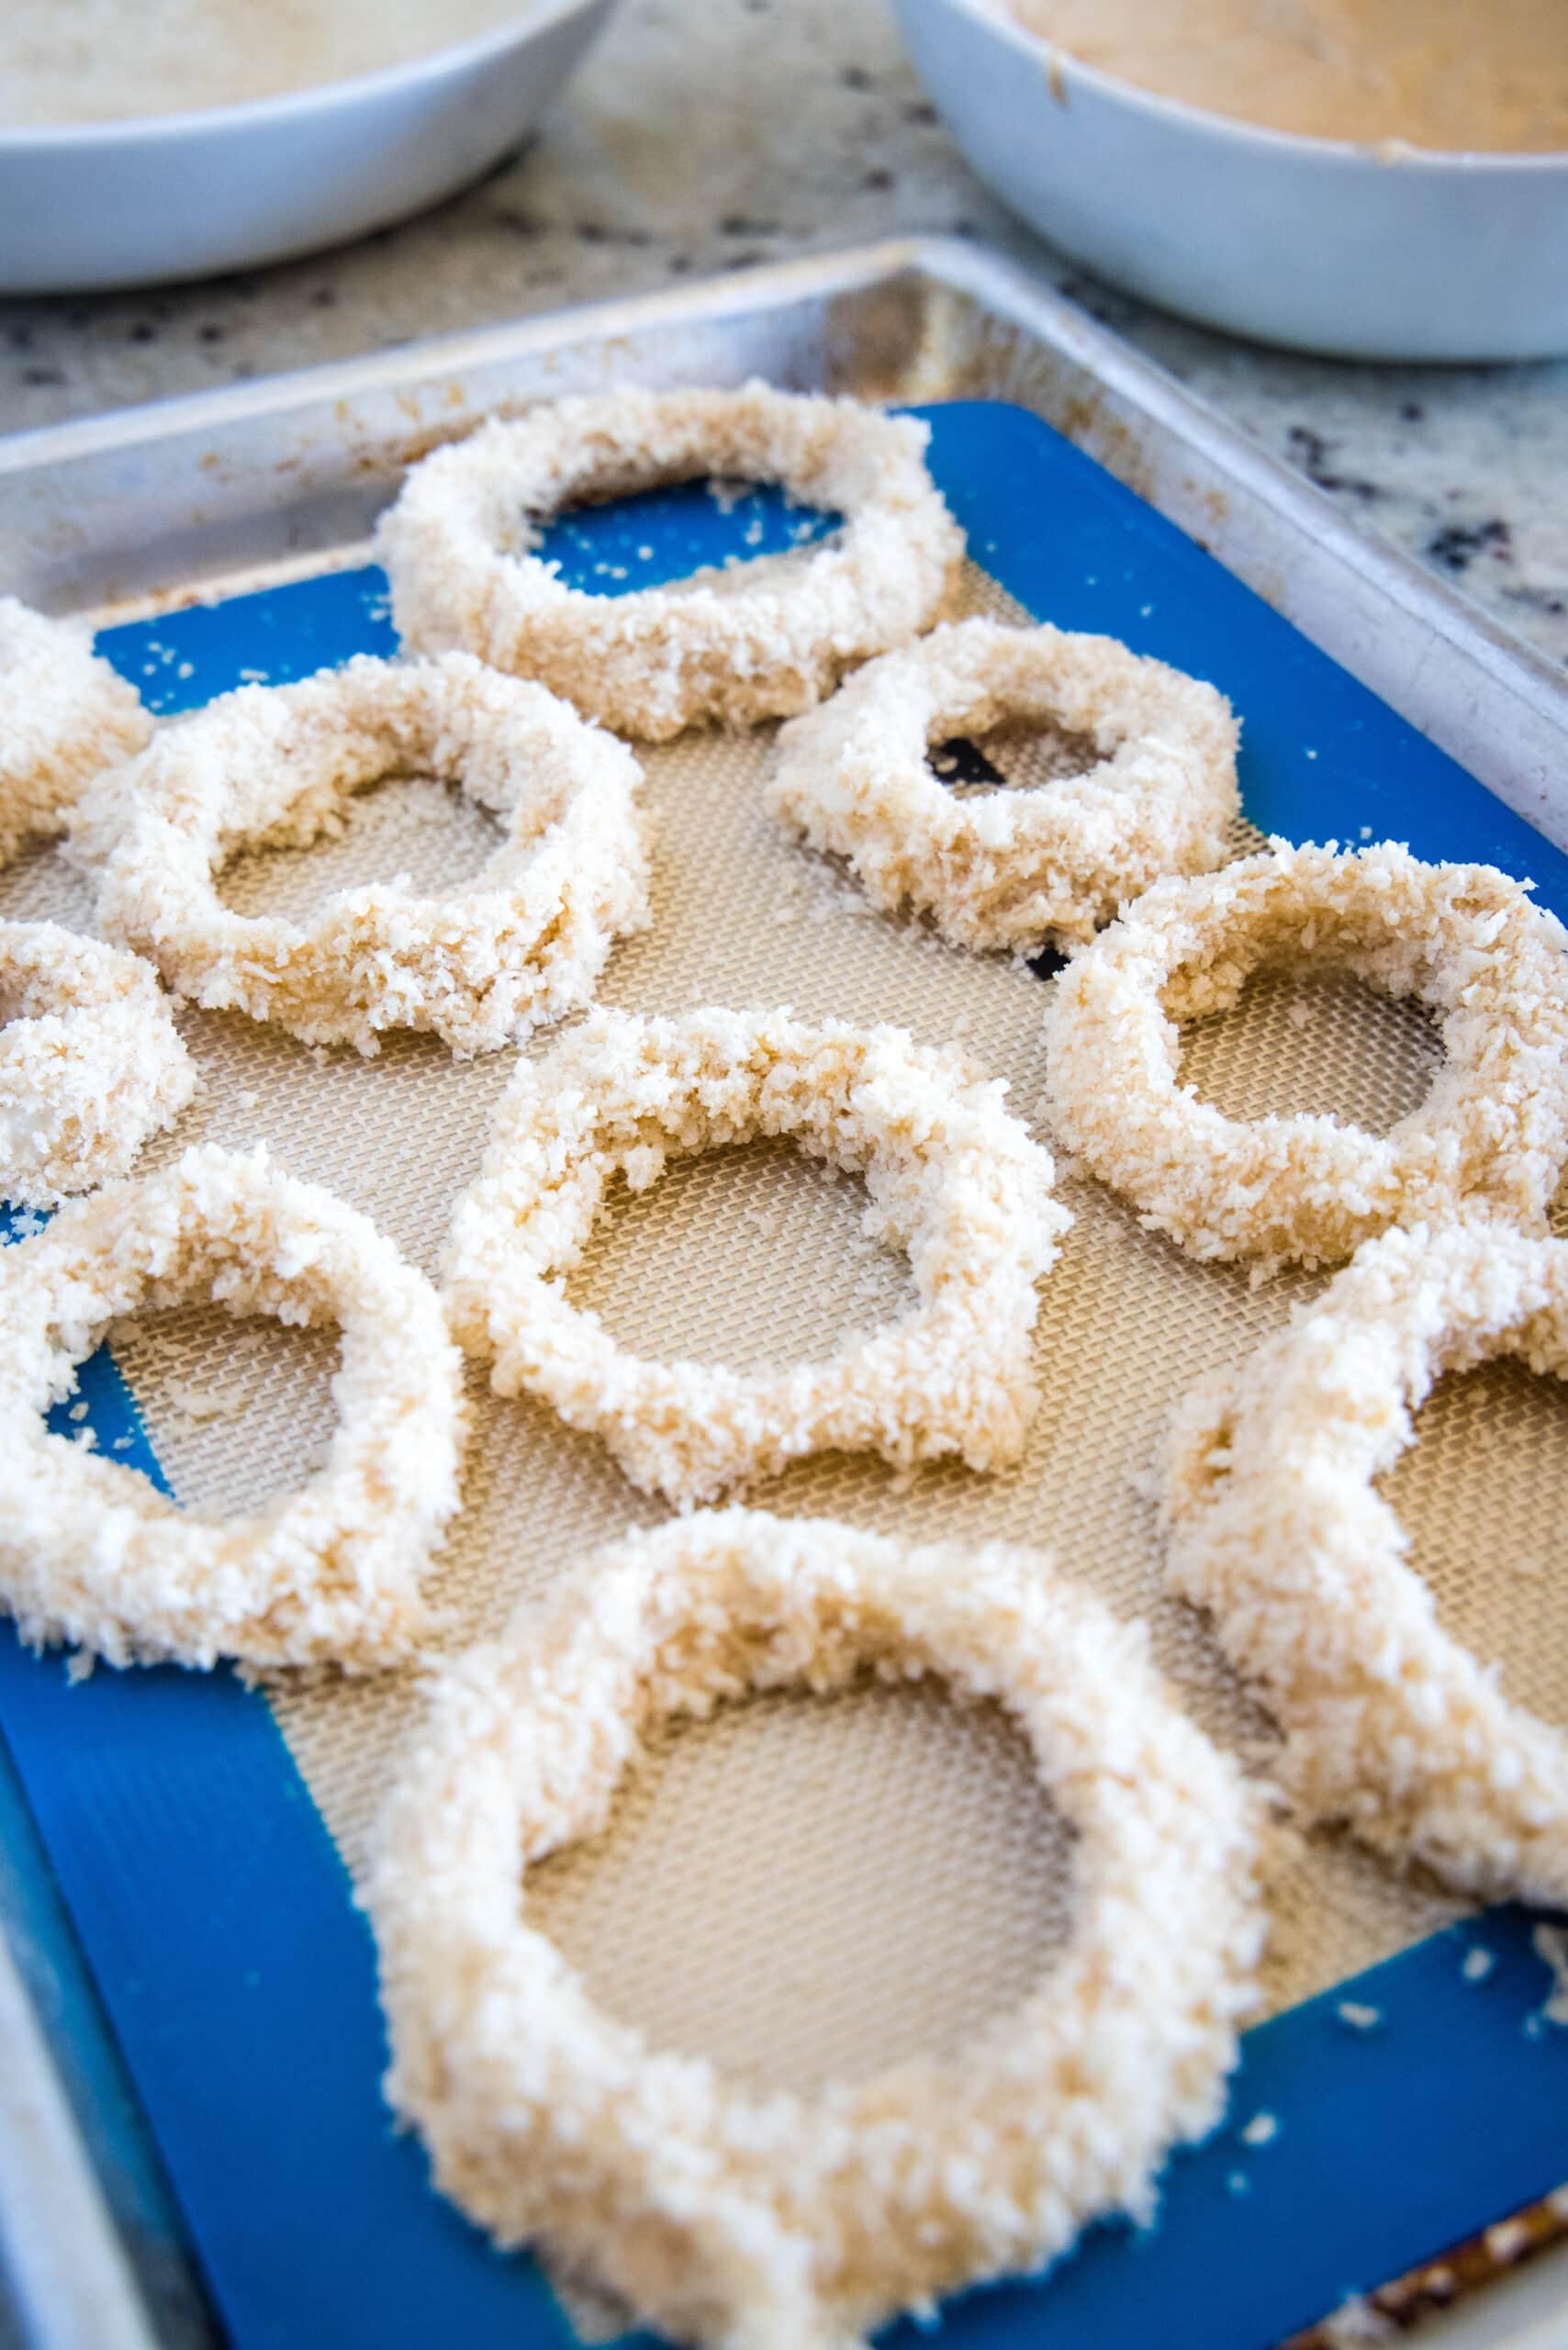 coated onion rings on baking sheet